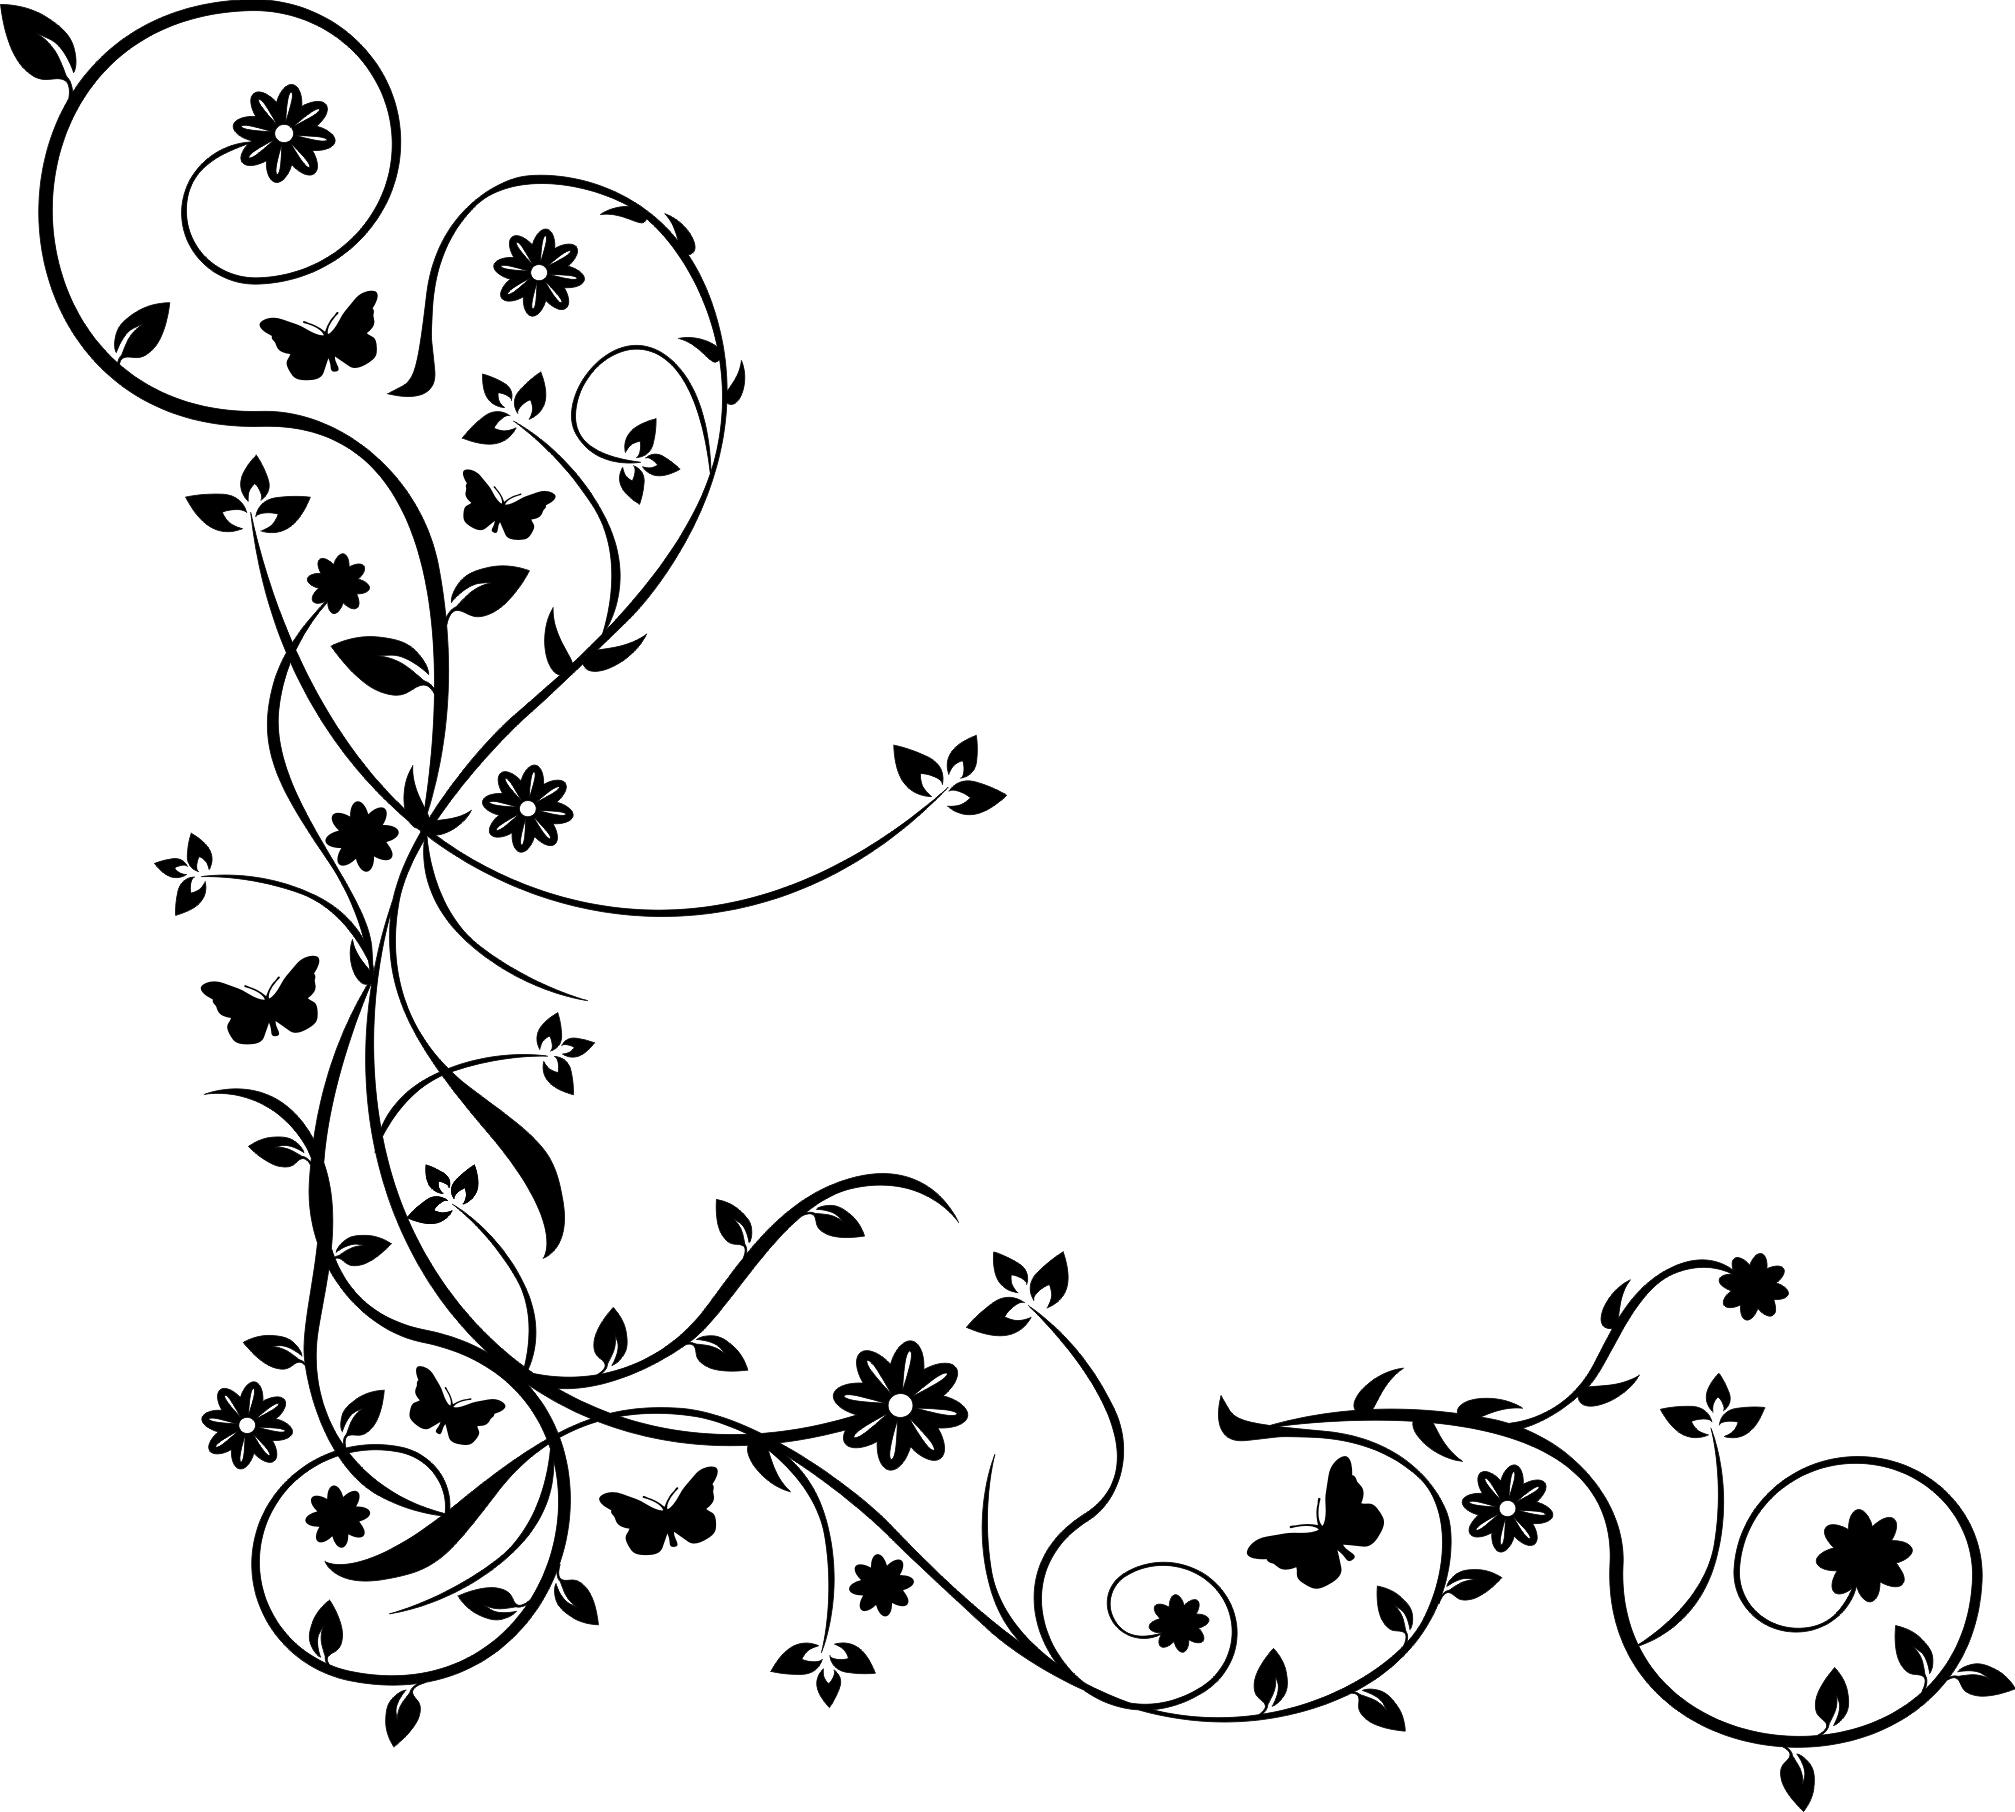 Blumenranken Bilder 6958325186016728063 Jpg 2 015 1 812 Pixels Blumenranken Tattoo Blumenranken Blumenranken Vorlagen